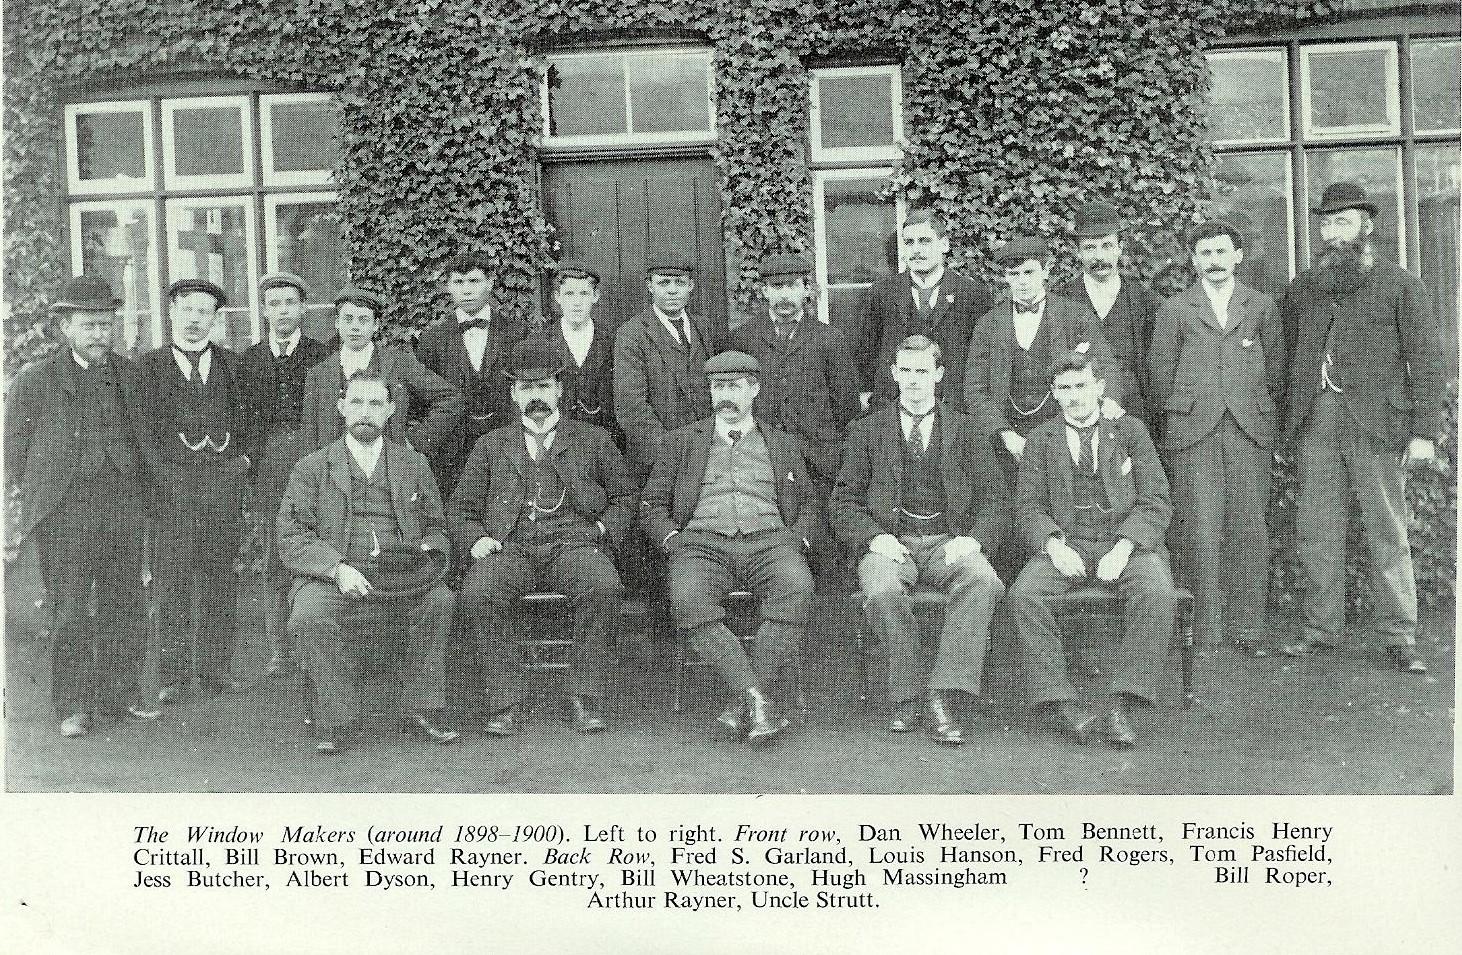 The Original Window Makers around 1900